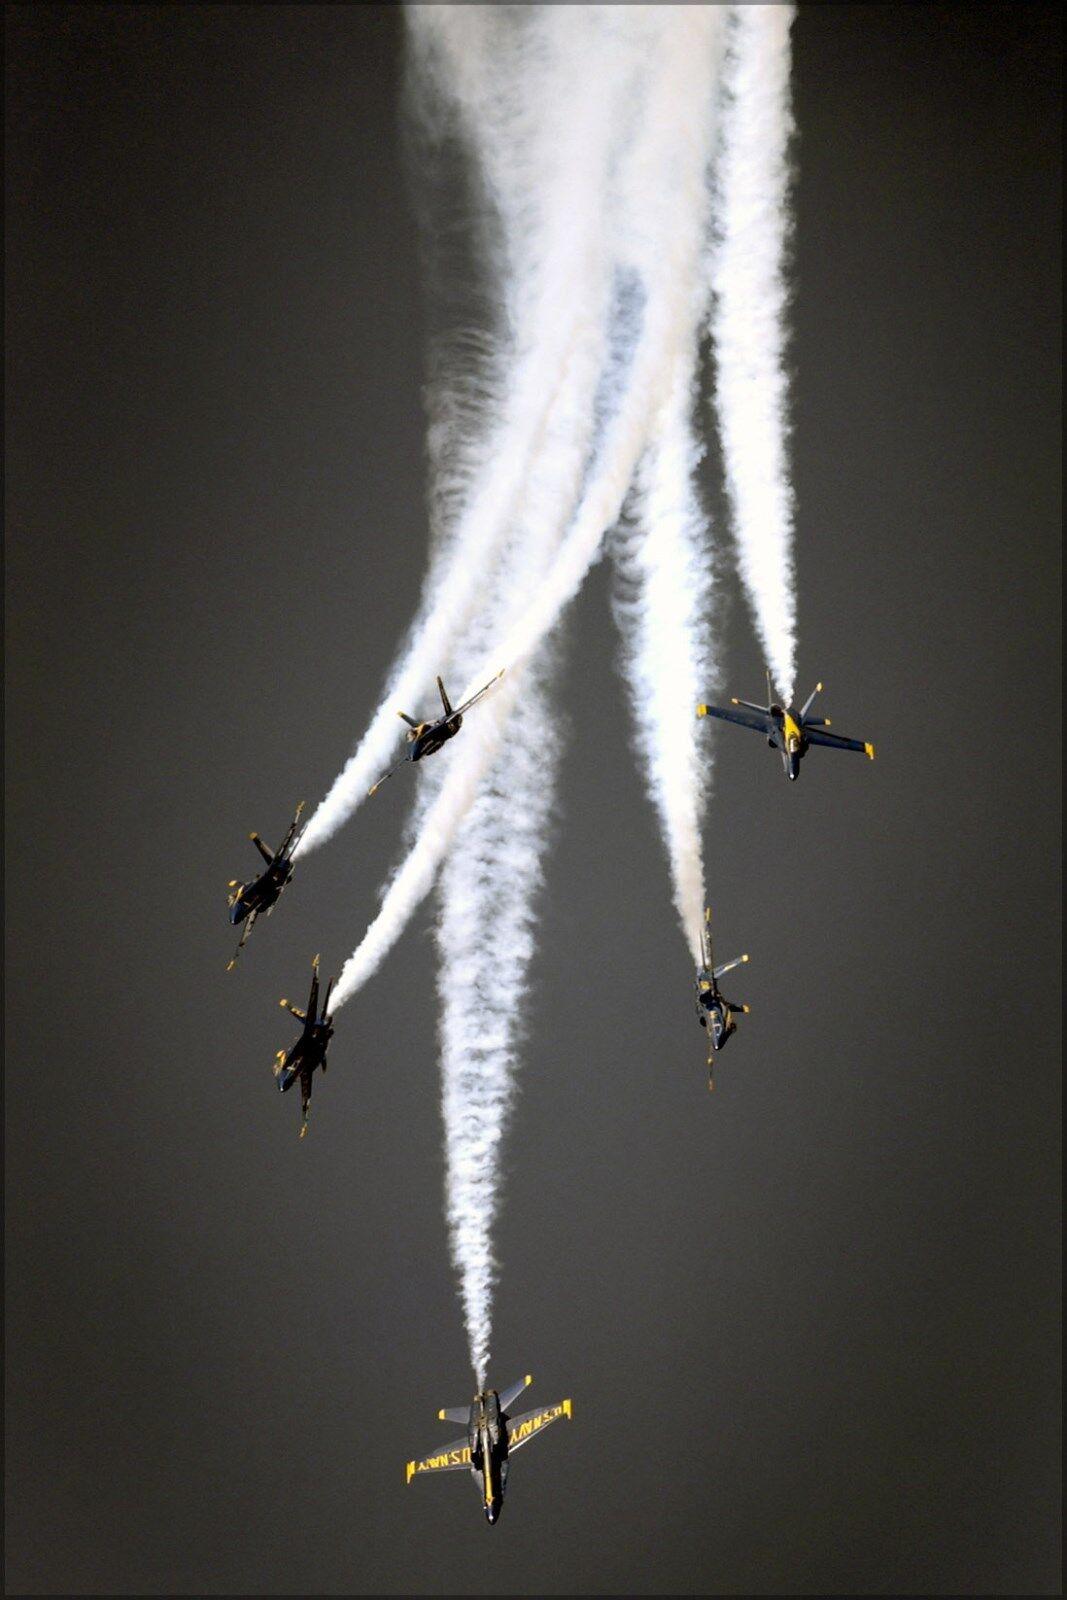 Plakat, Viele Größen; THE U.S.Navy's Flug Demonstration Team Blau Angels,